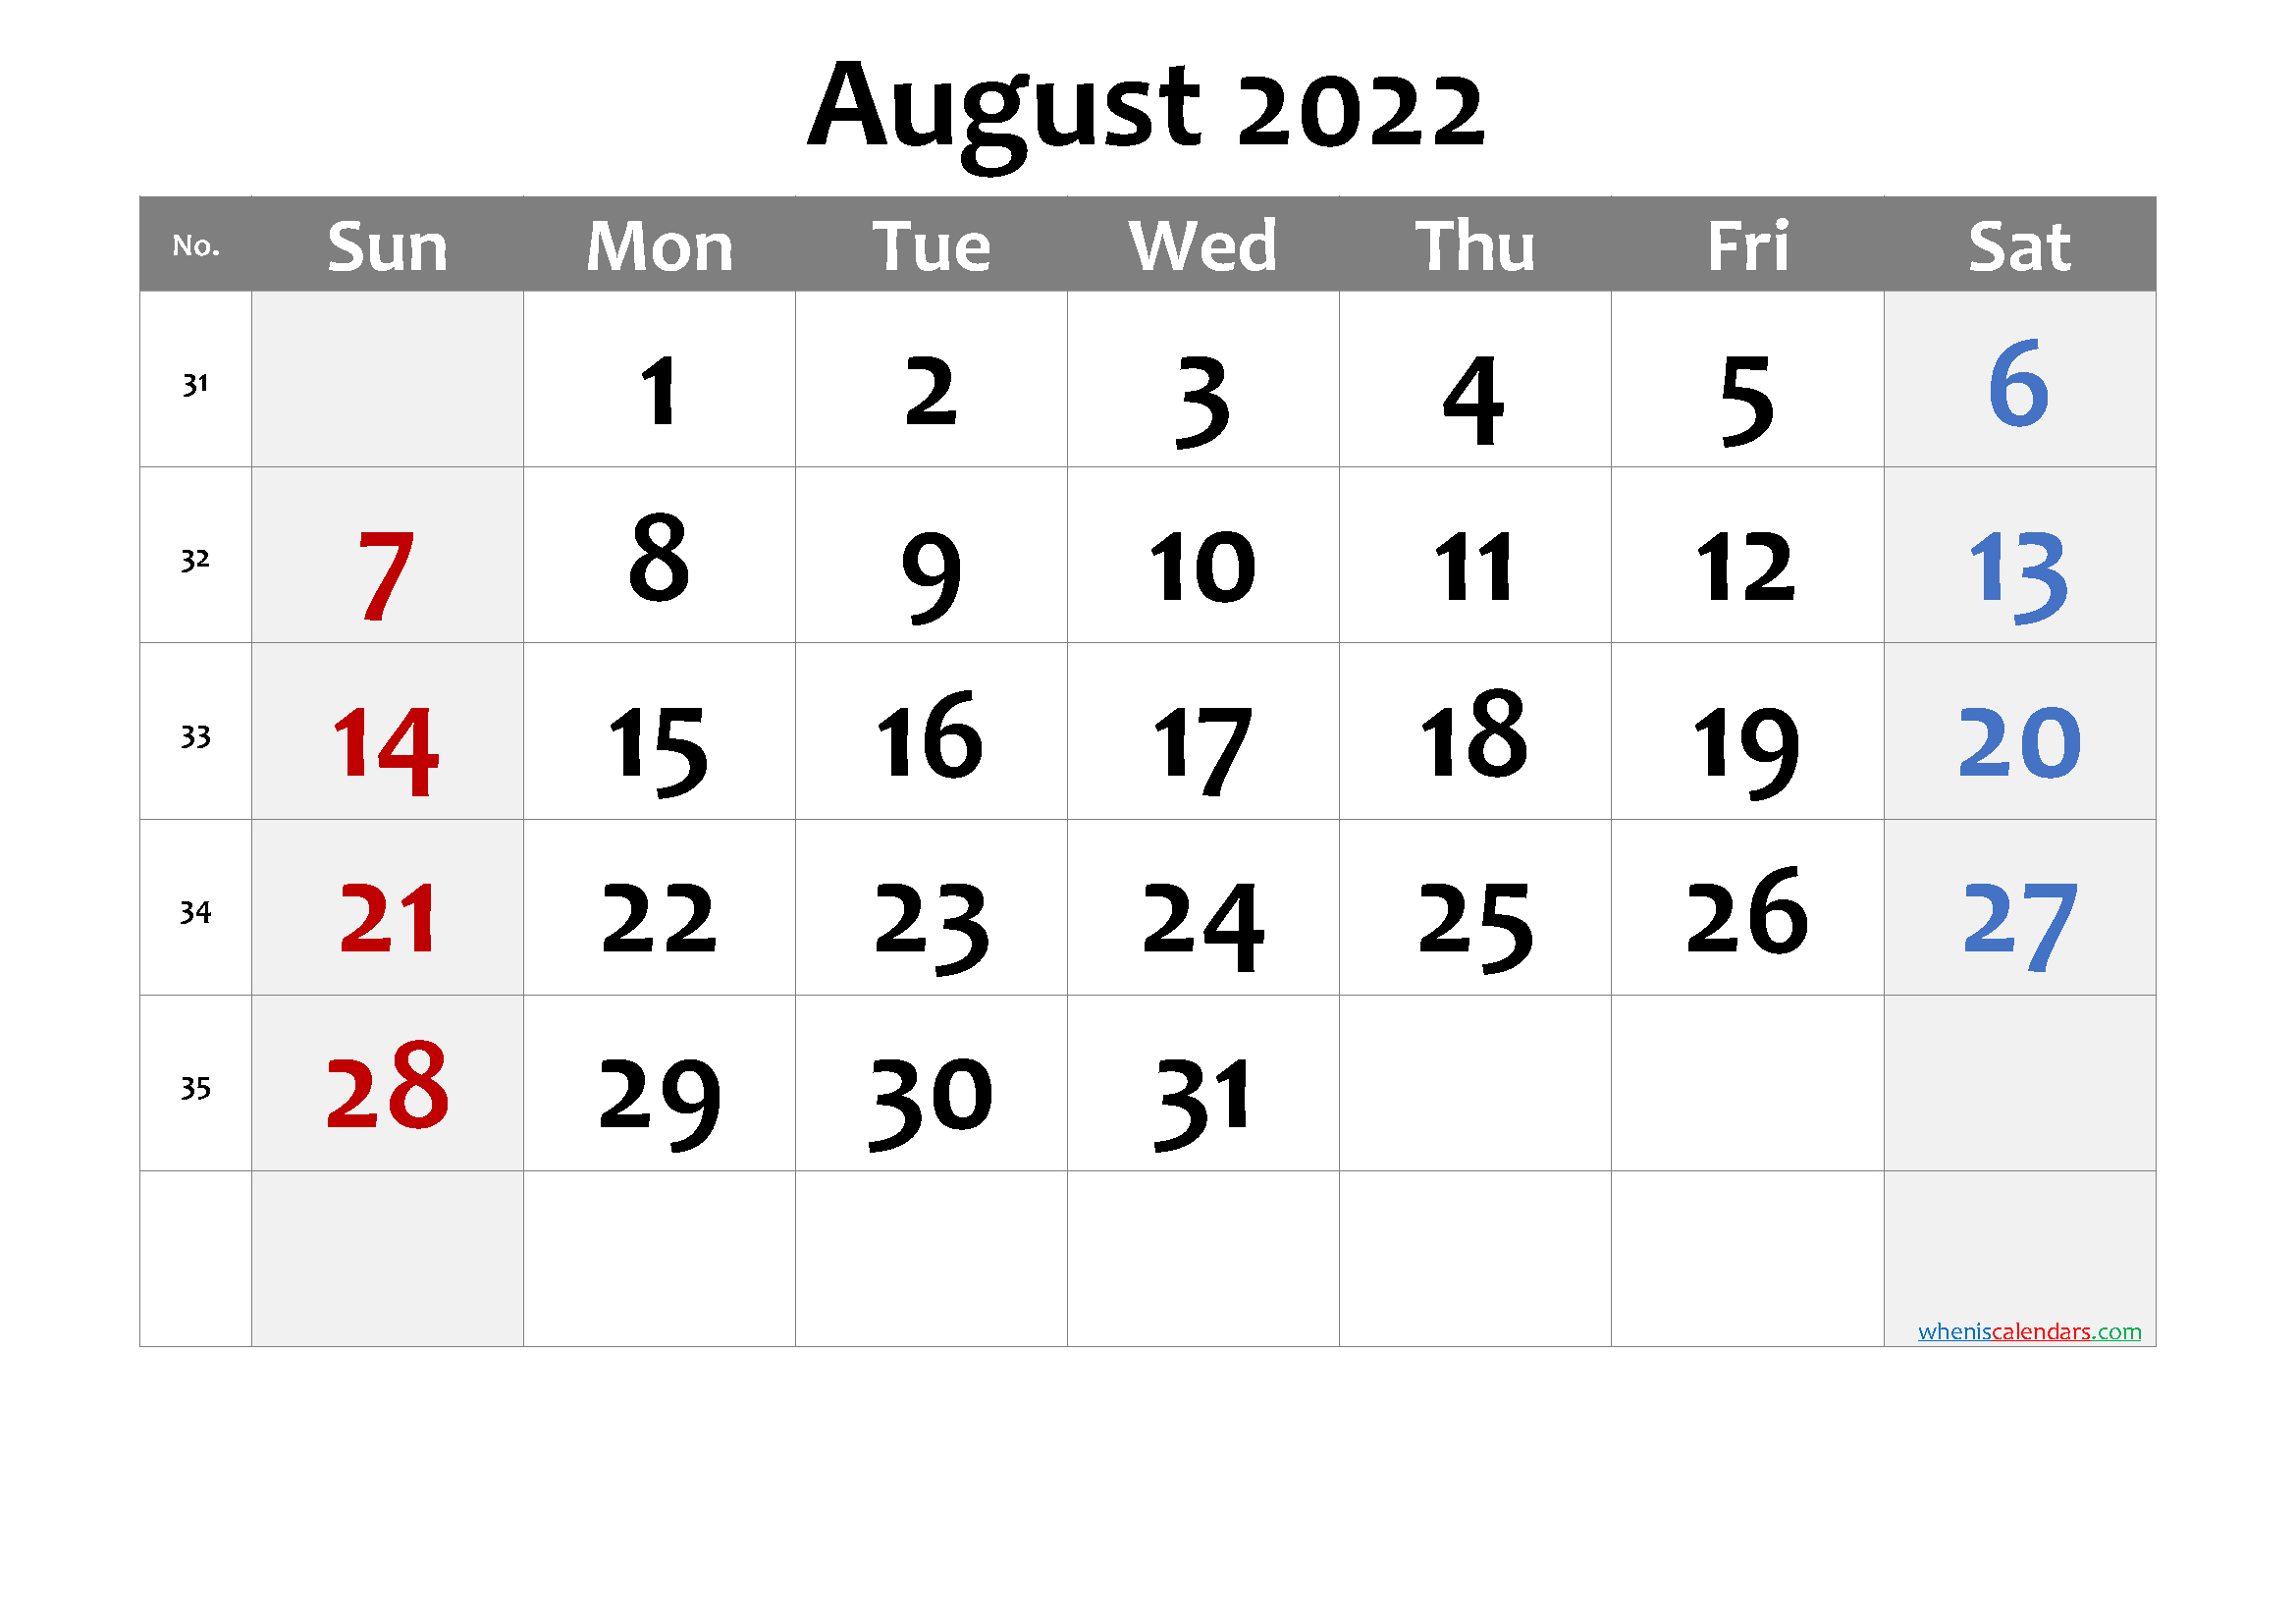 August September 2022 Calendar